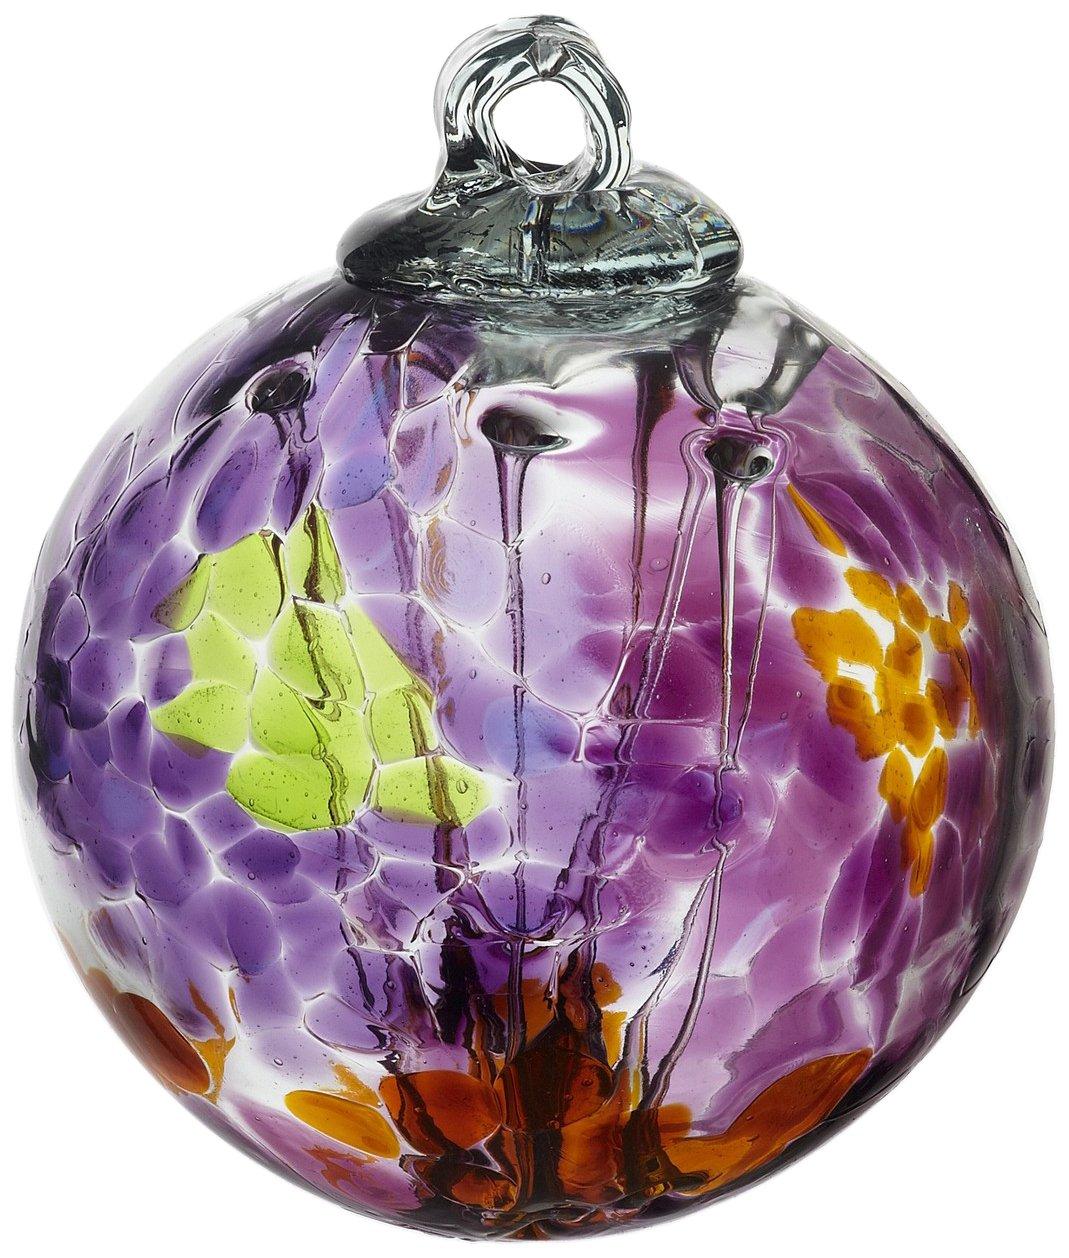 Kitras Art Glass Decorative Spirit Ball, 6-Inch, Burgundy